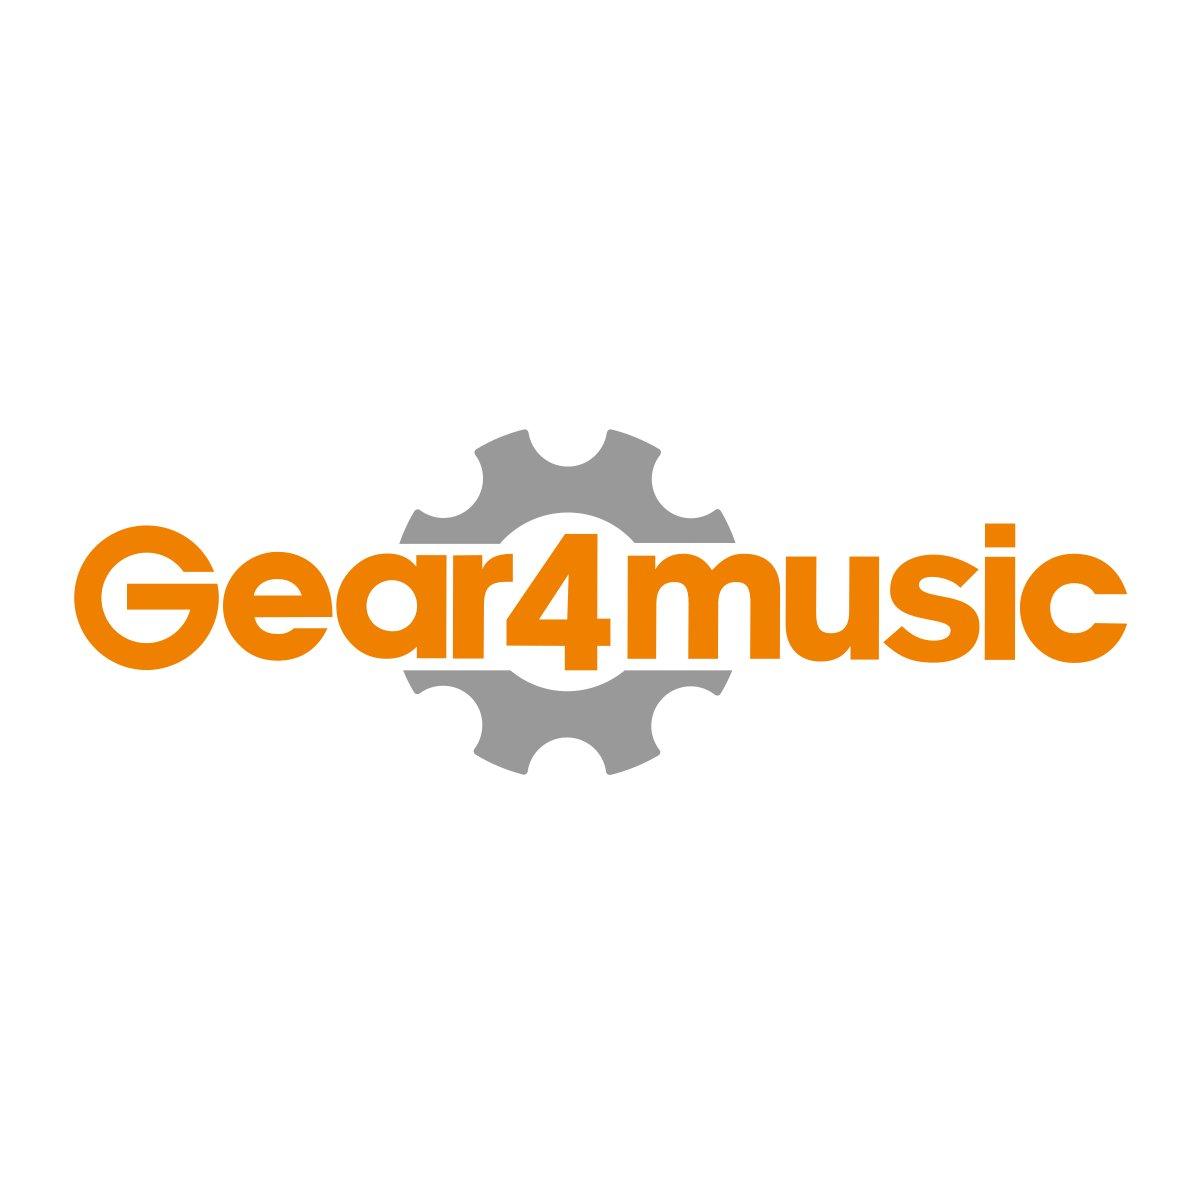 Seattle Short Scale Bass Guitar by Gear4music, Black